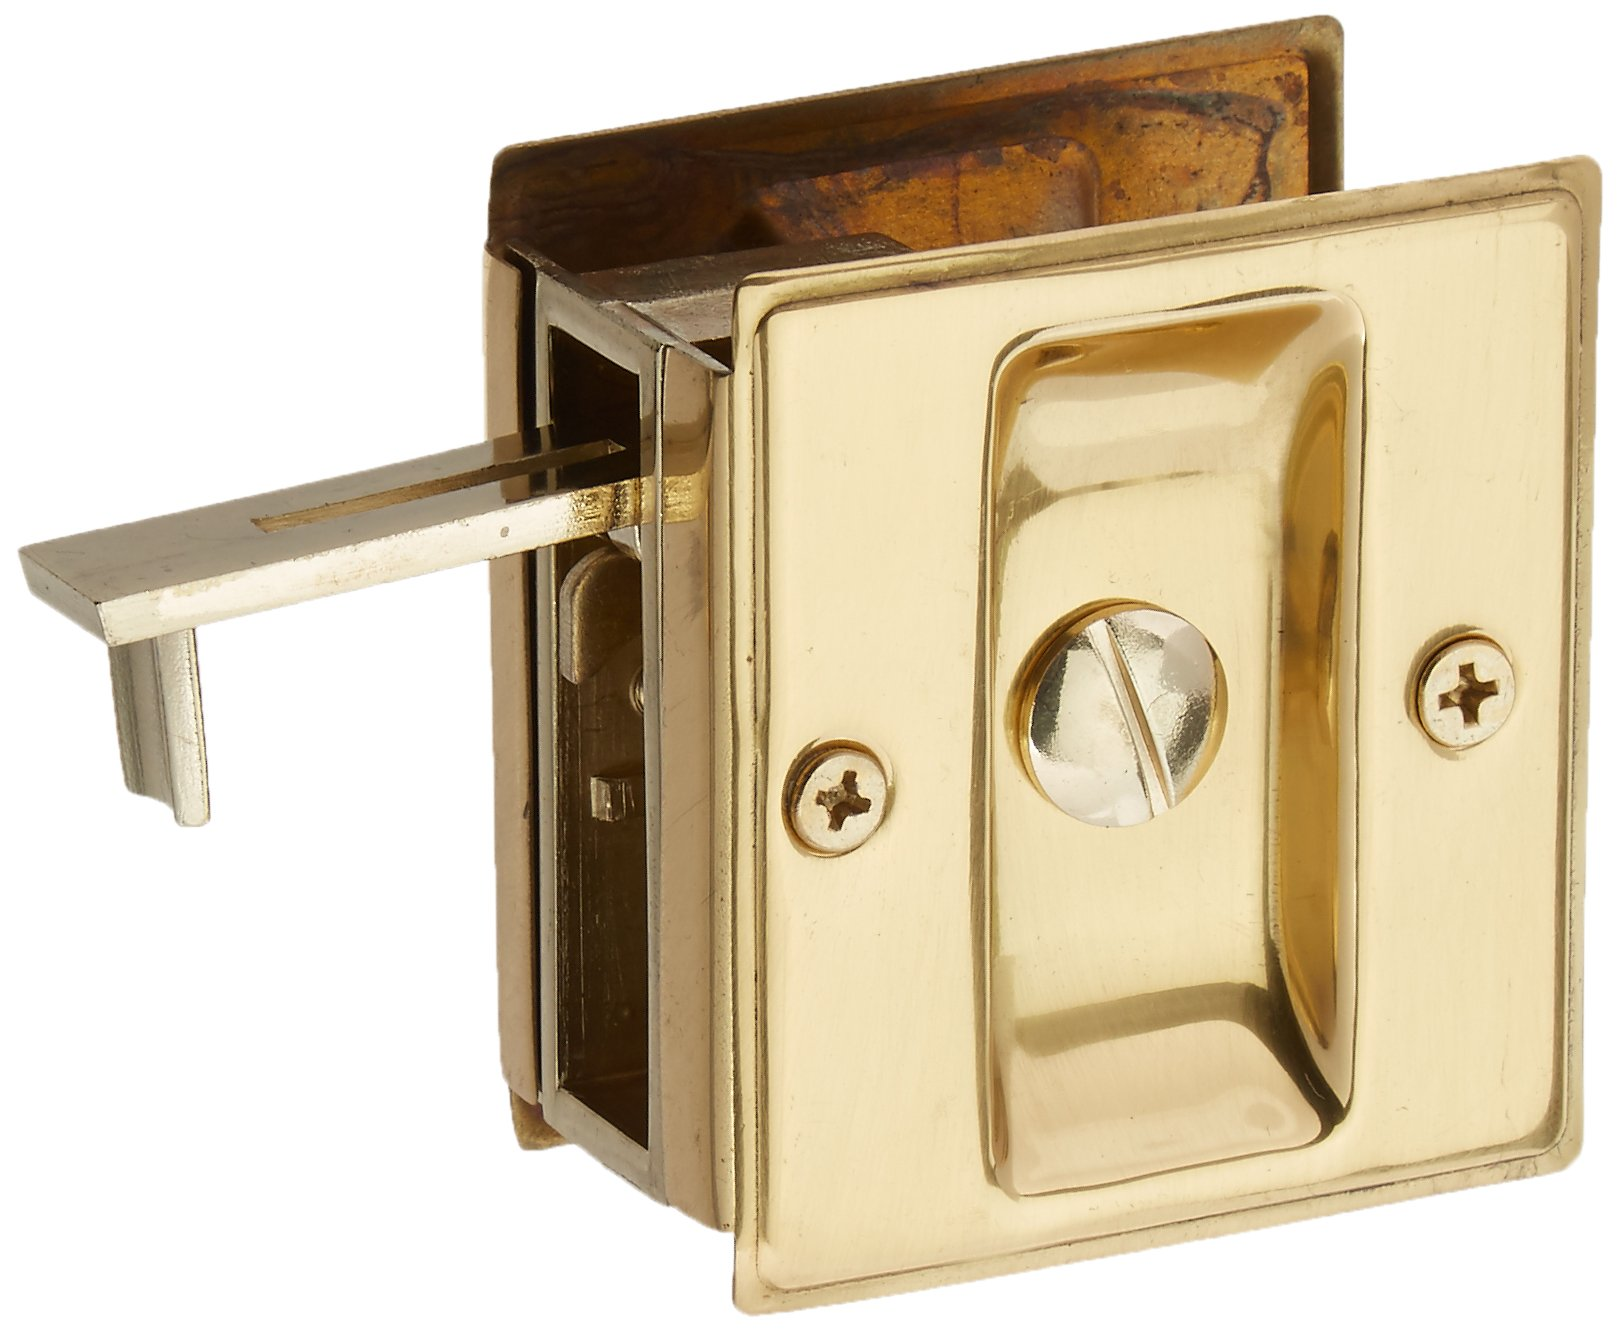 Deltana SDL25U3 2 1/2-Inch x 2 3/4-Inch Privacy Pocket Locks